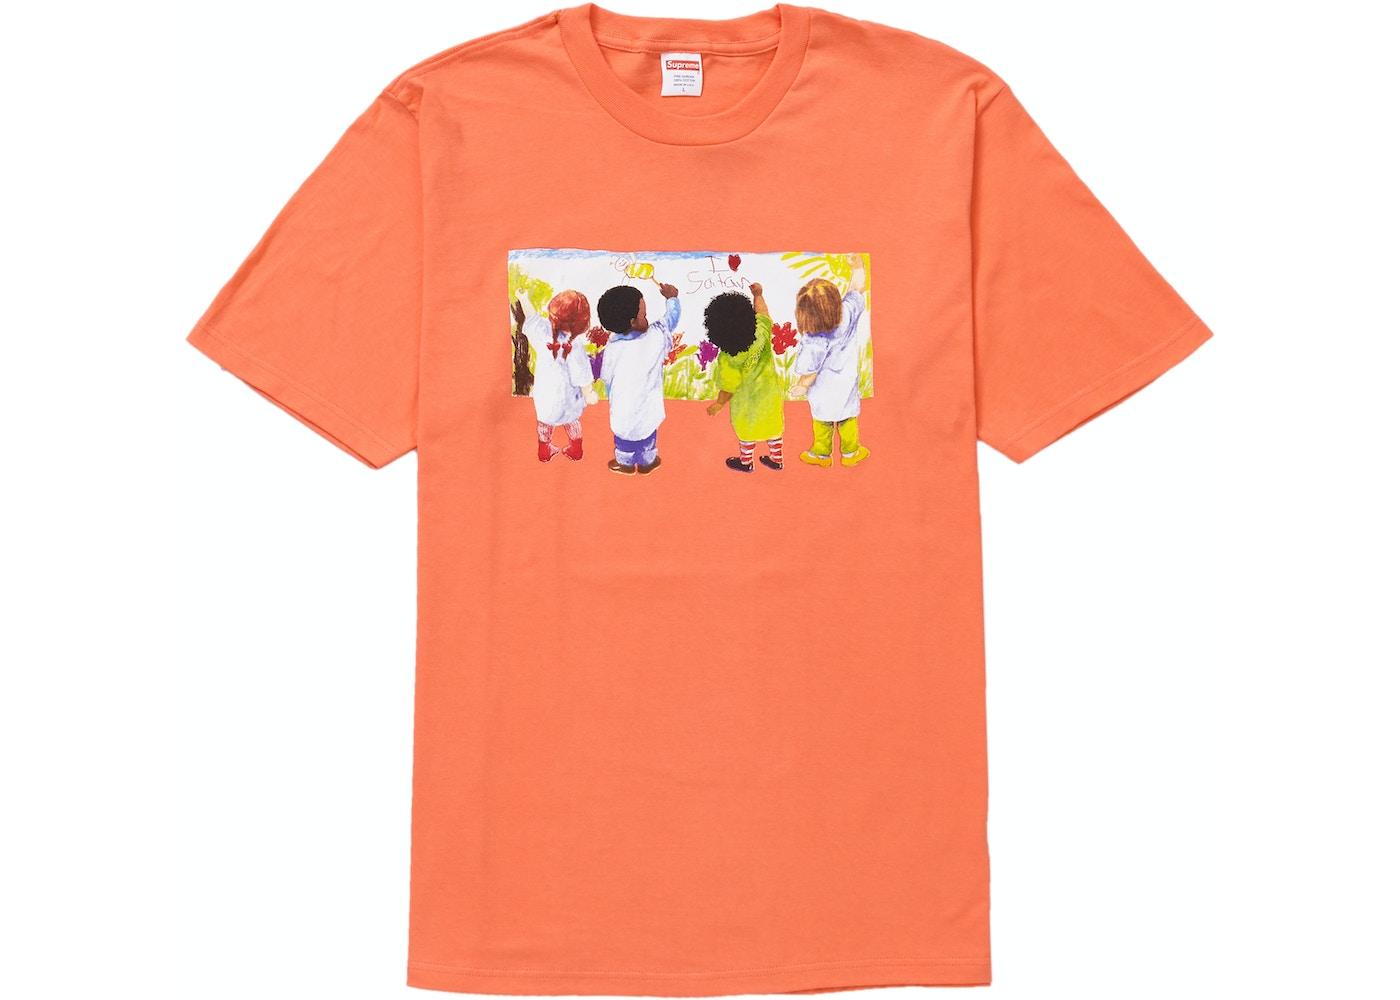 c3a4e0ee09a4 Supreme Kids Tee Neon Orange - SS19